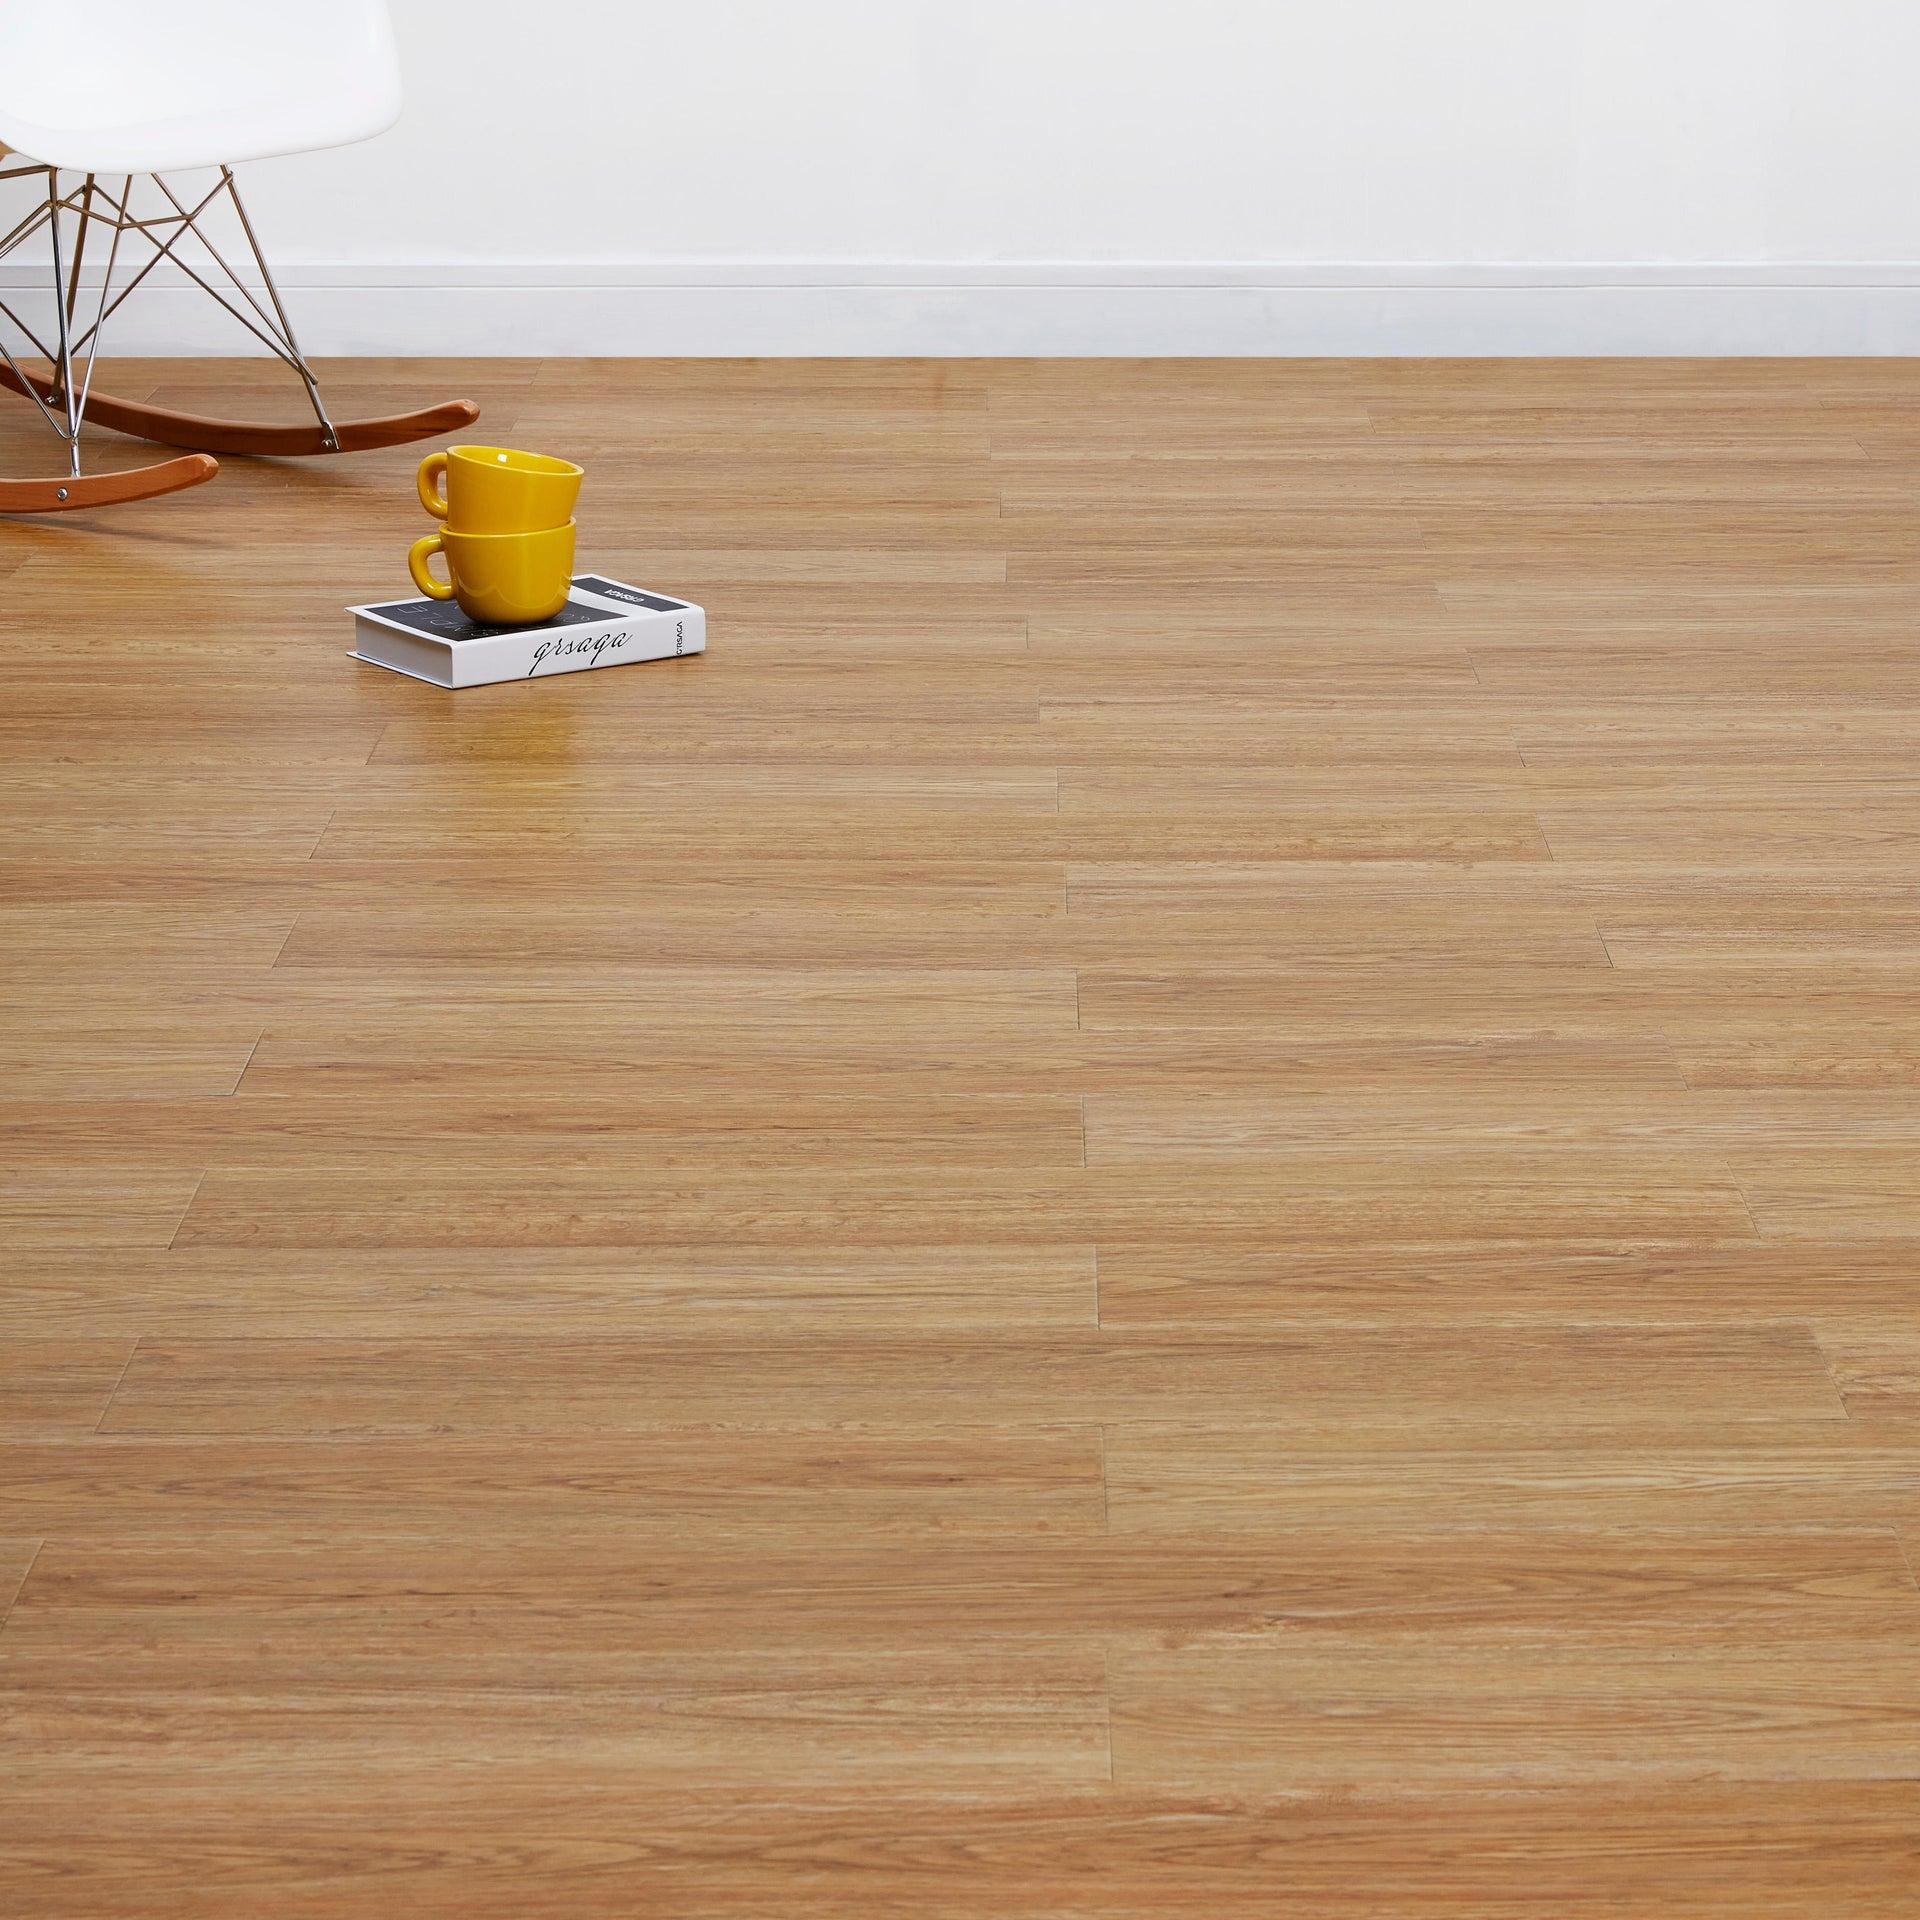 Pavimento PVC adesivo Soft Natural Sp 2 mm beige - 1